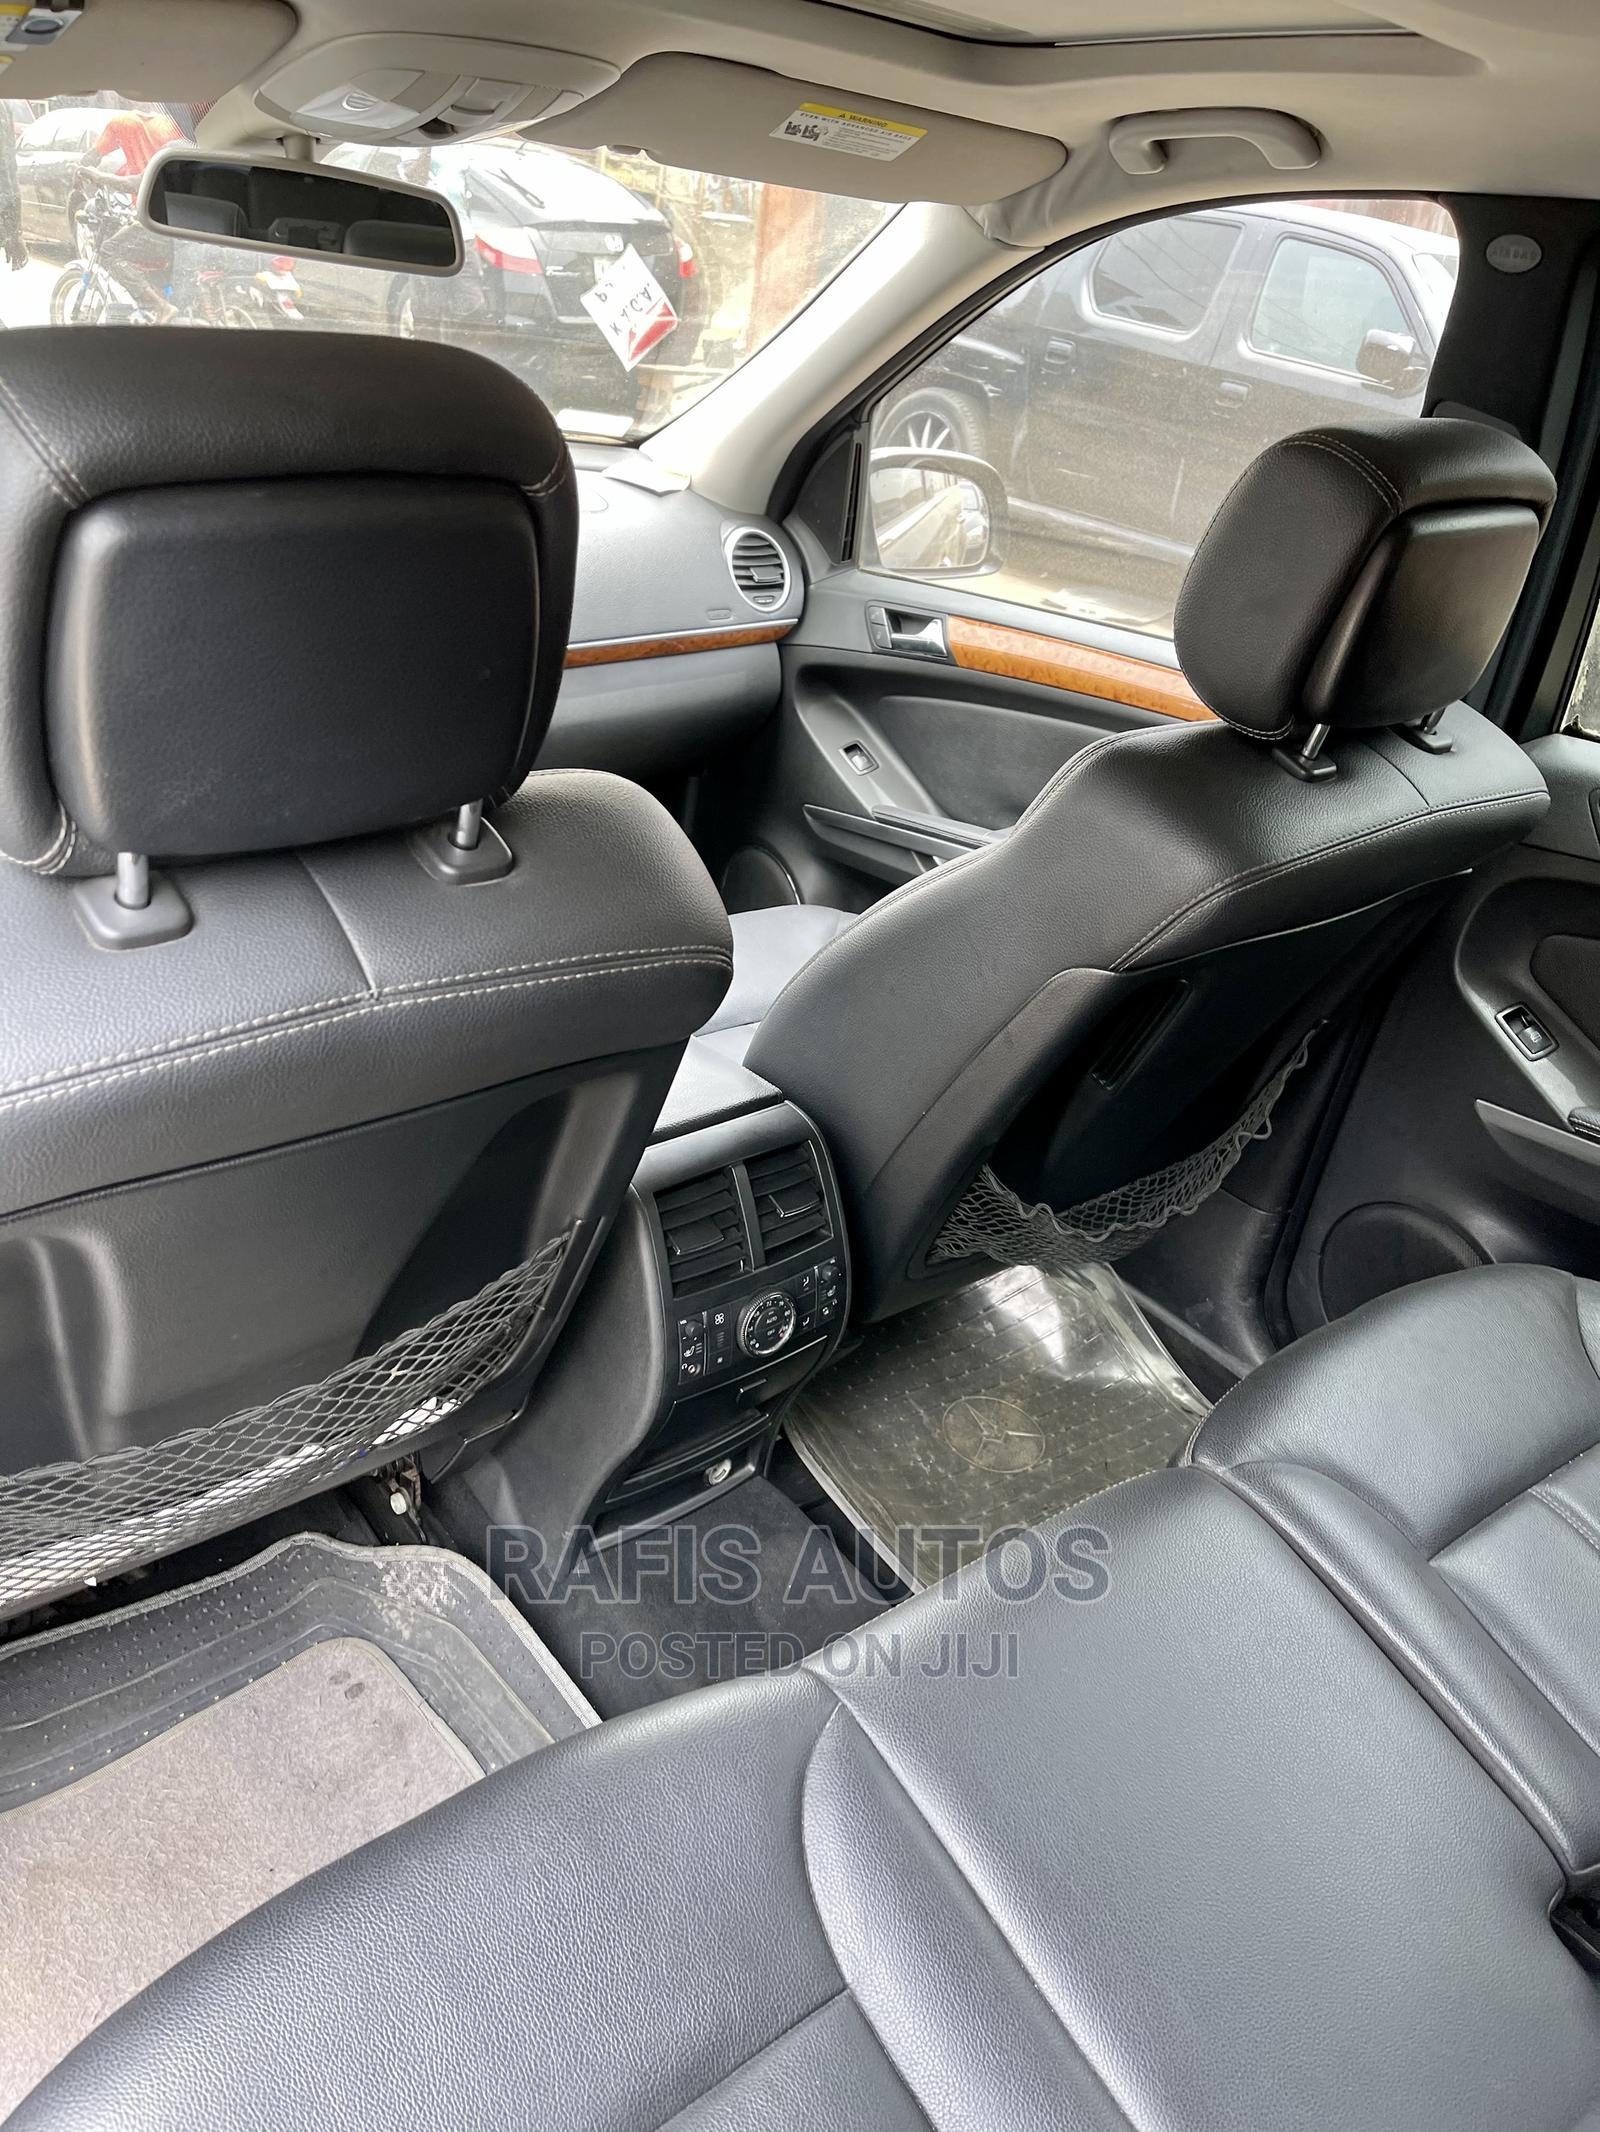 Mercedes-Benz GL Class 2007 GL 450 Black | Cars for sale in Yaba, Lagos State, Nigeria